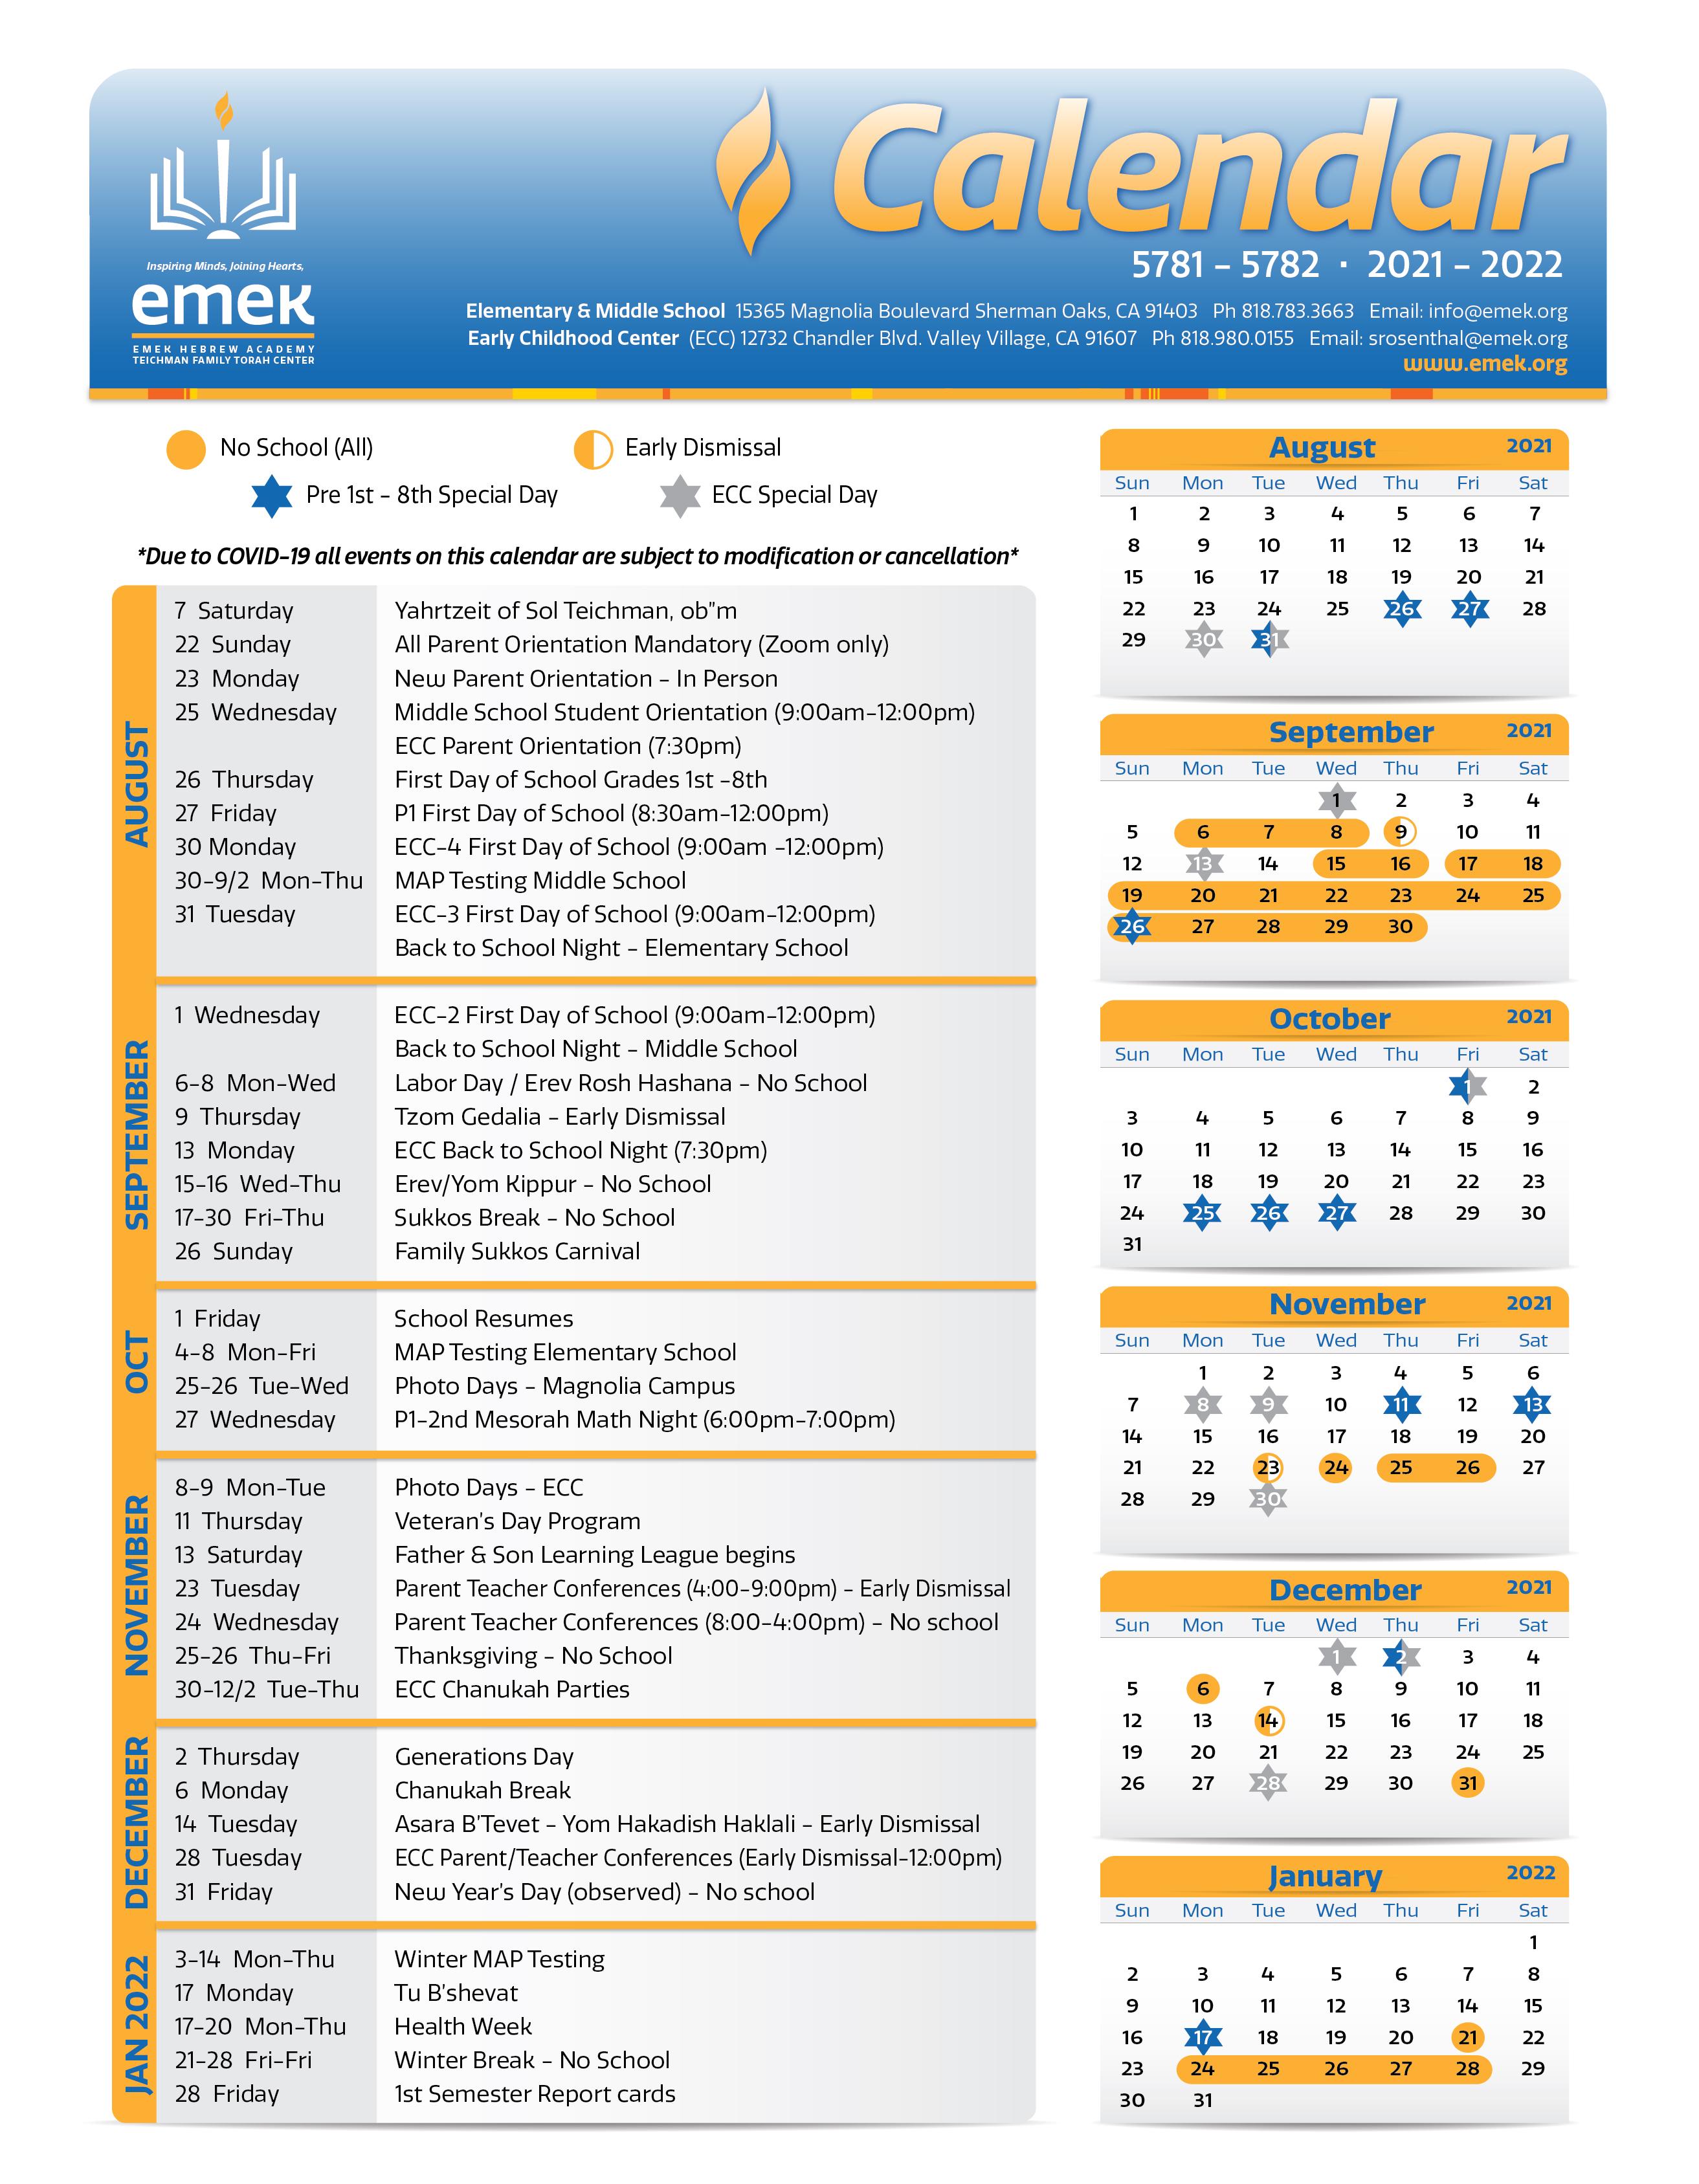 EMEK_Calendar_2021-01.jpeg